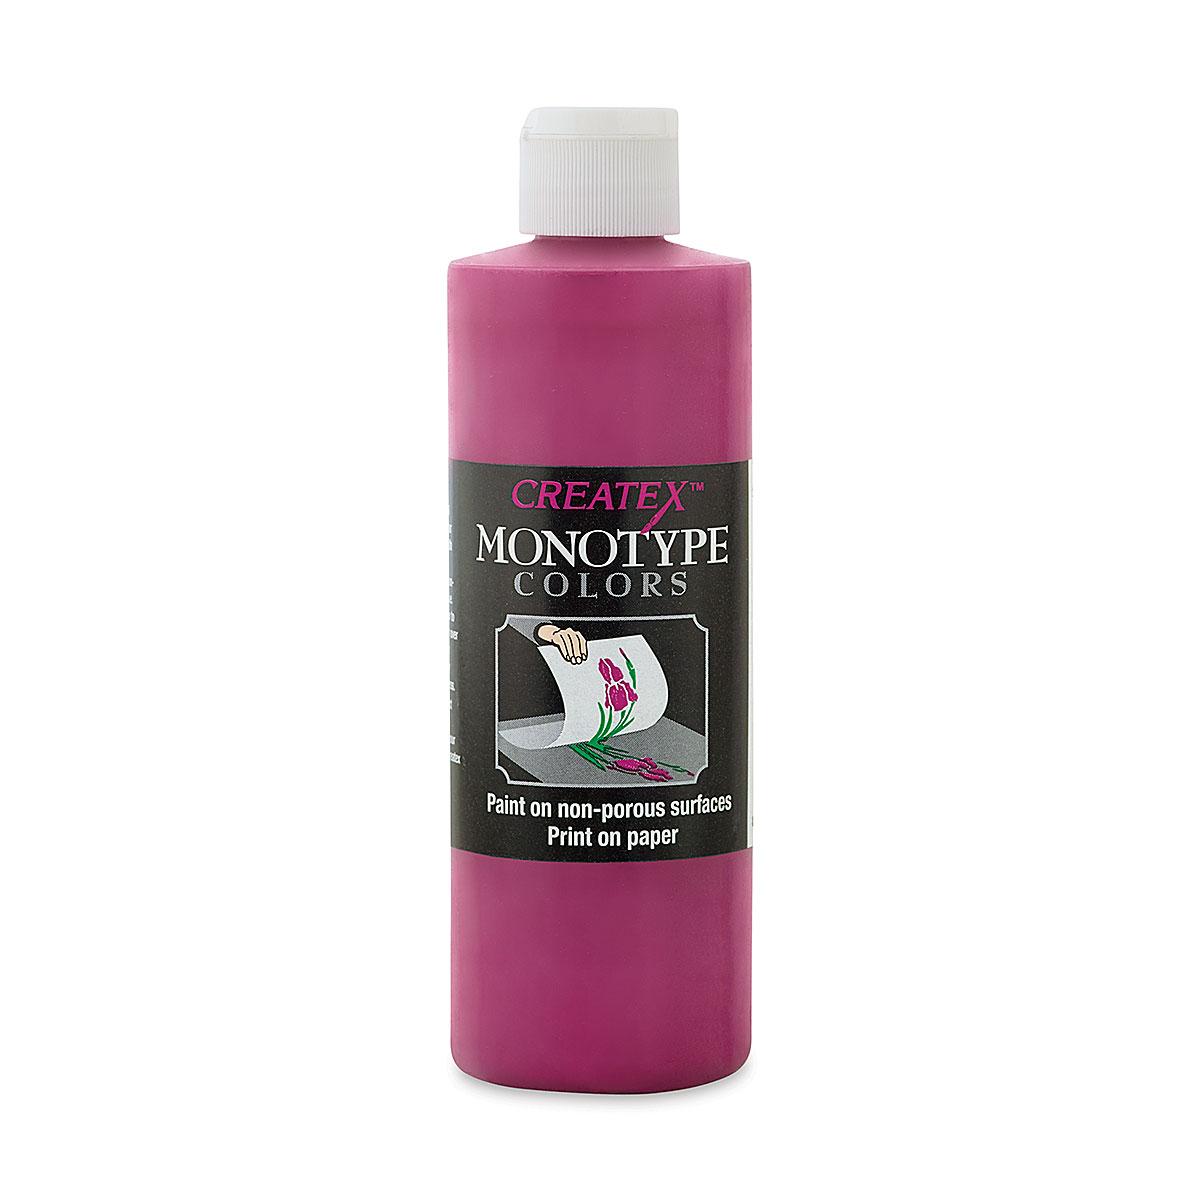 Createx Monotype Colors - Magenta, 8 oz bottle